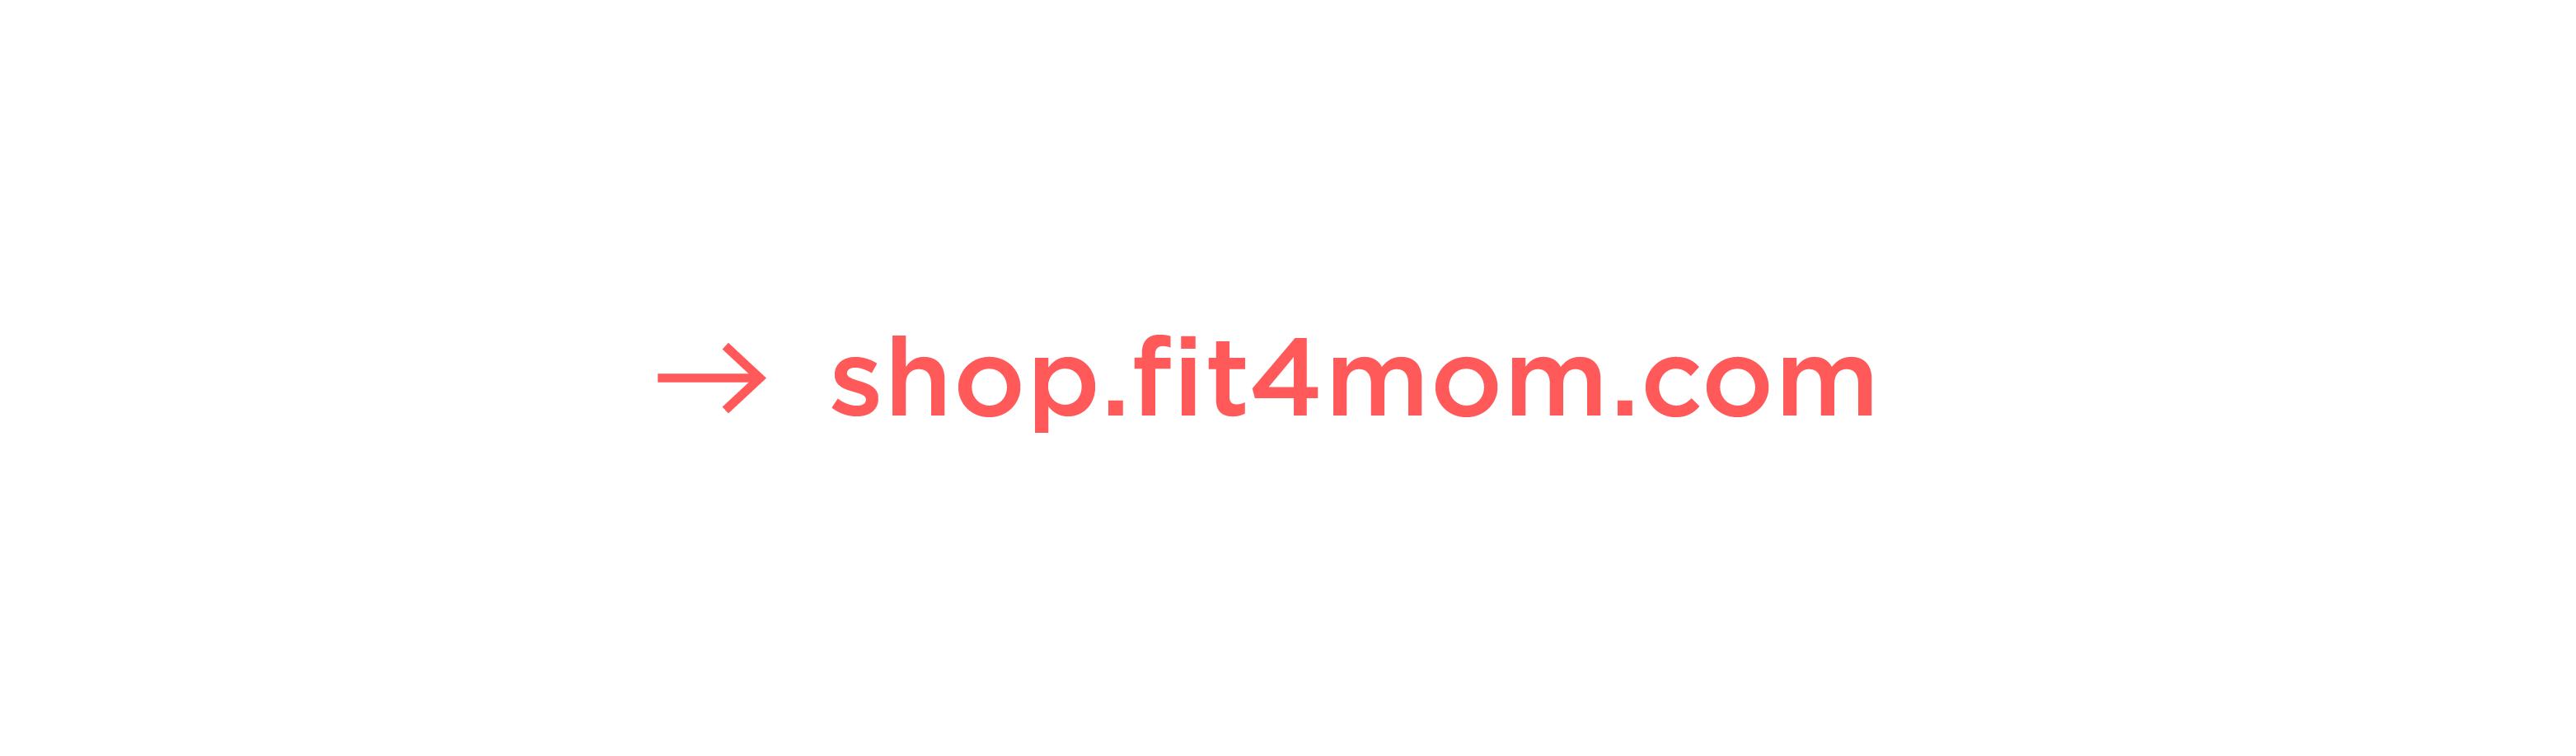 shop.fit4mom.com